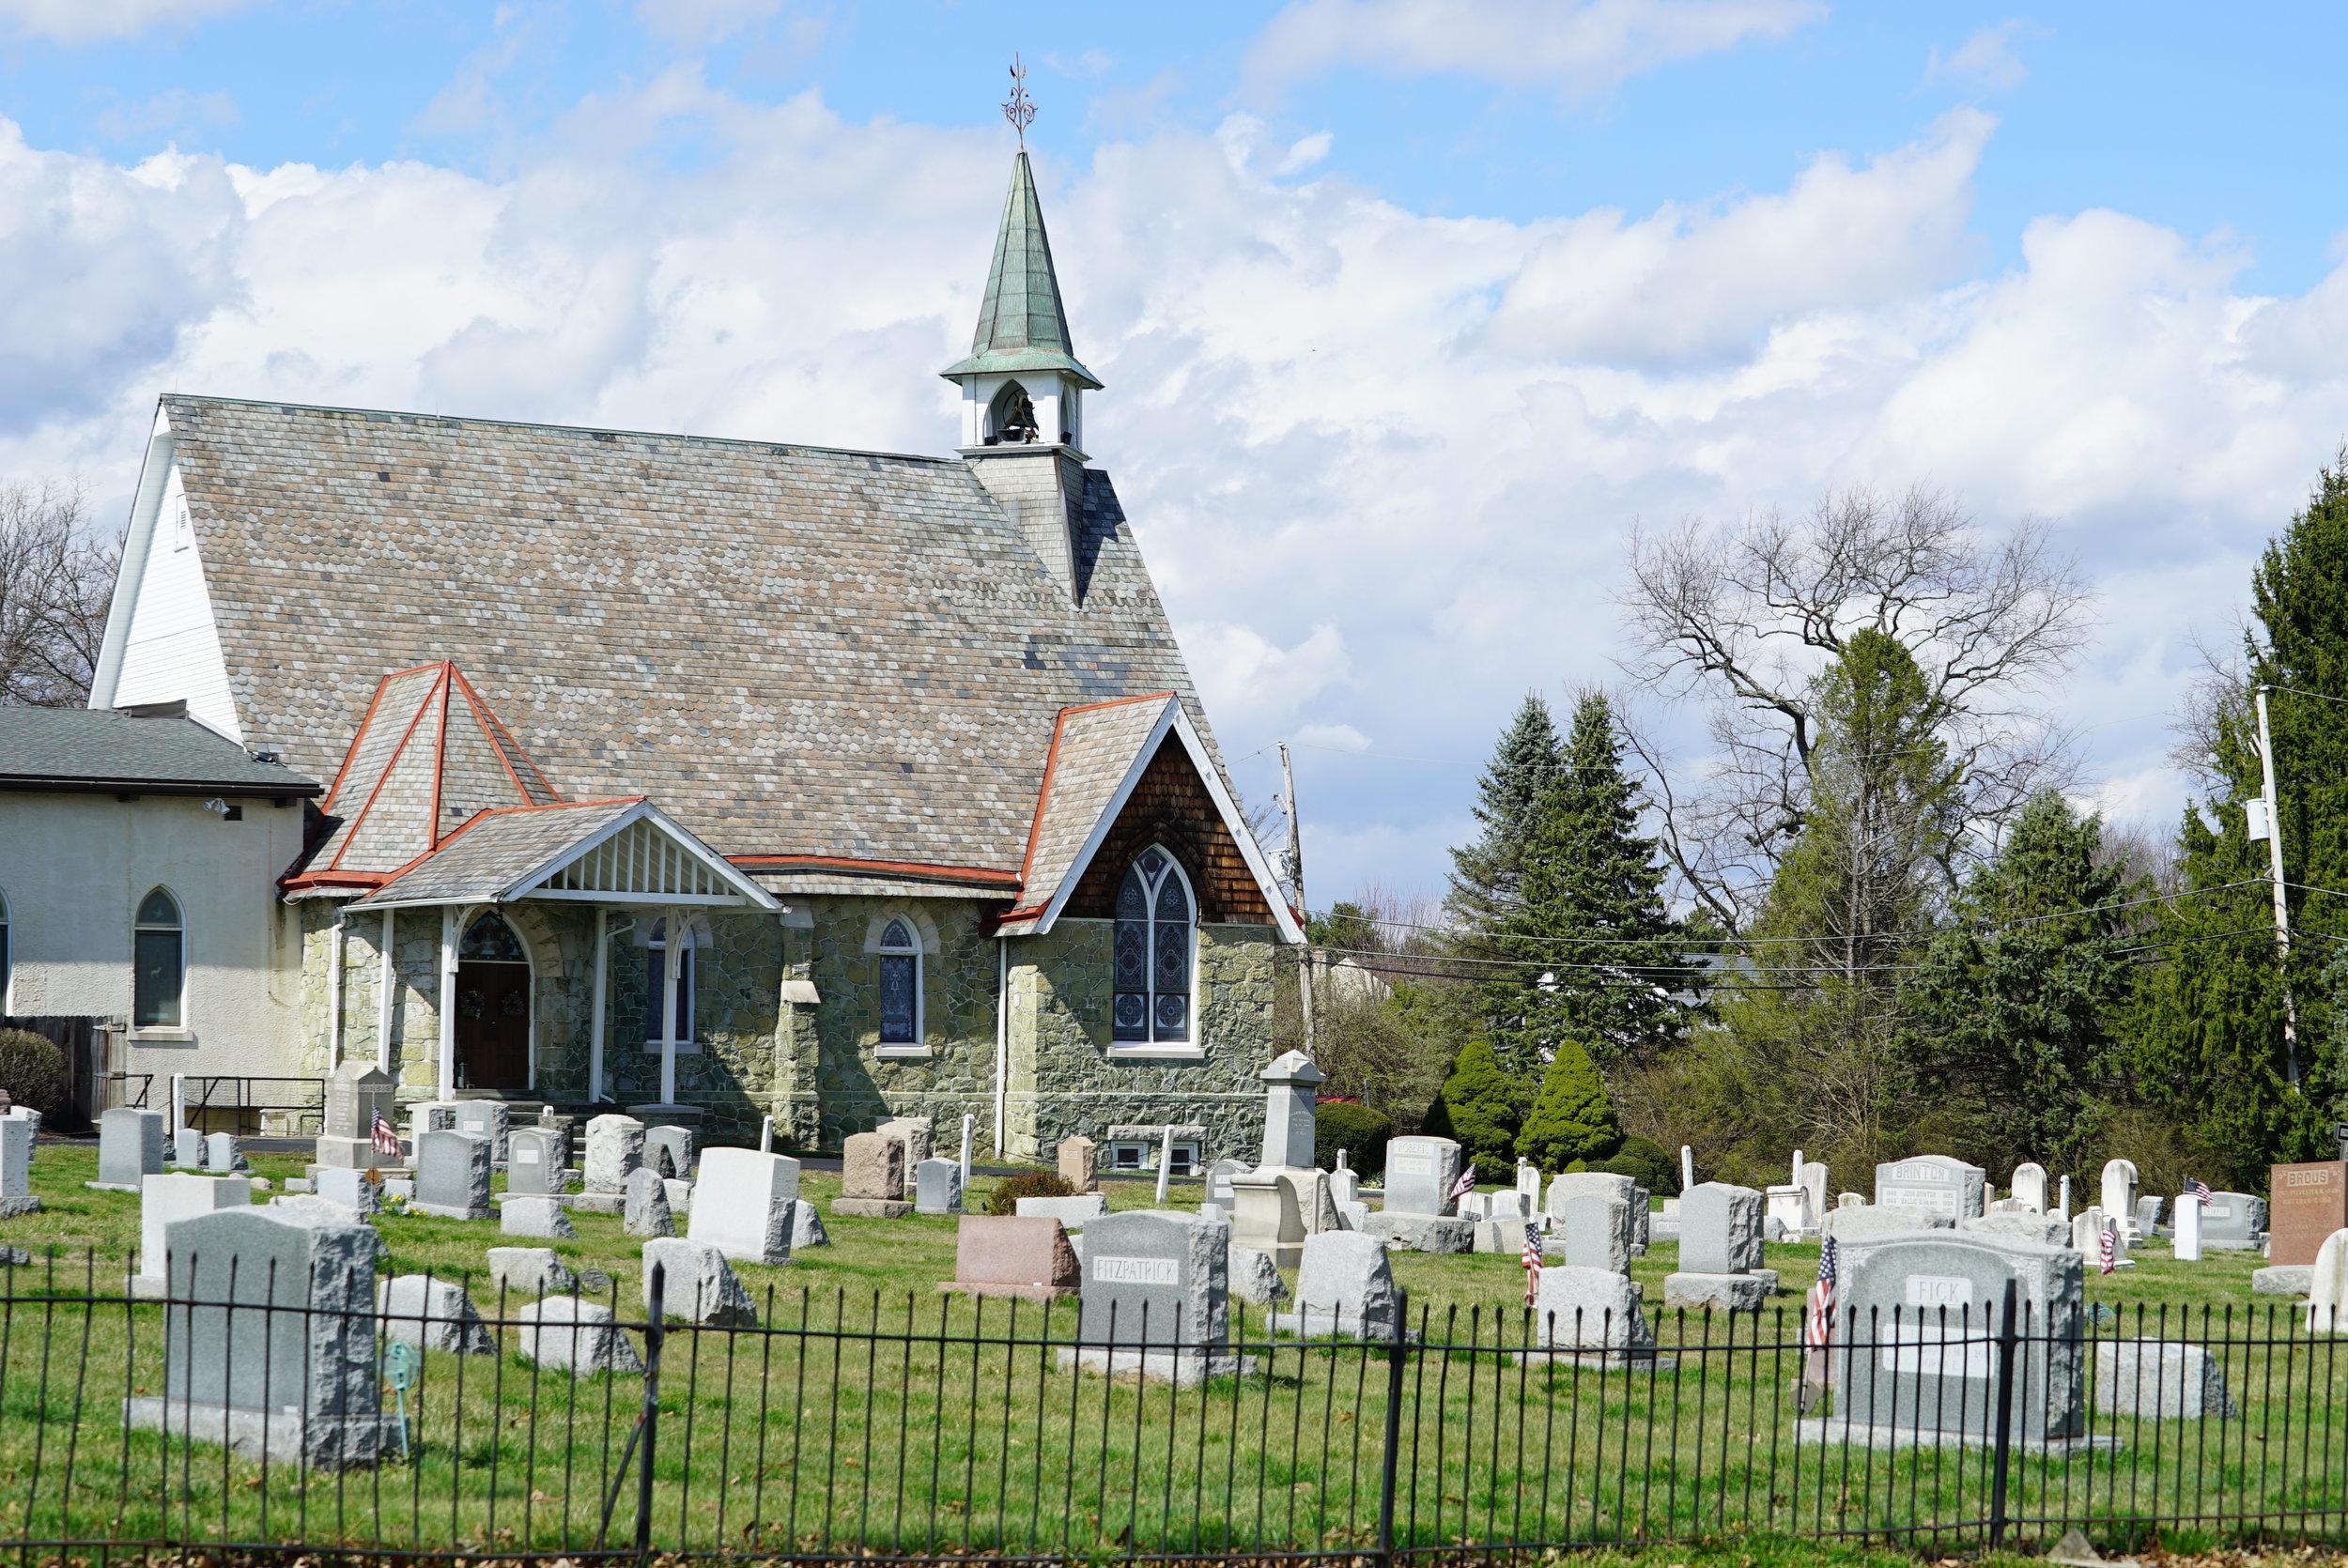 Bethlehem United Methodist Church Cemetery. Thornton, Pennsylvania. Early April 2017.